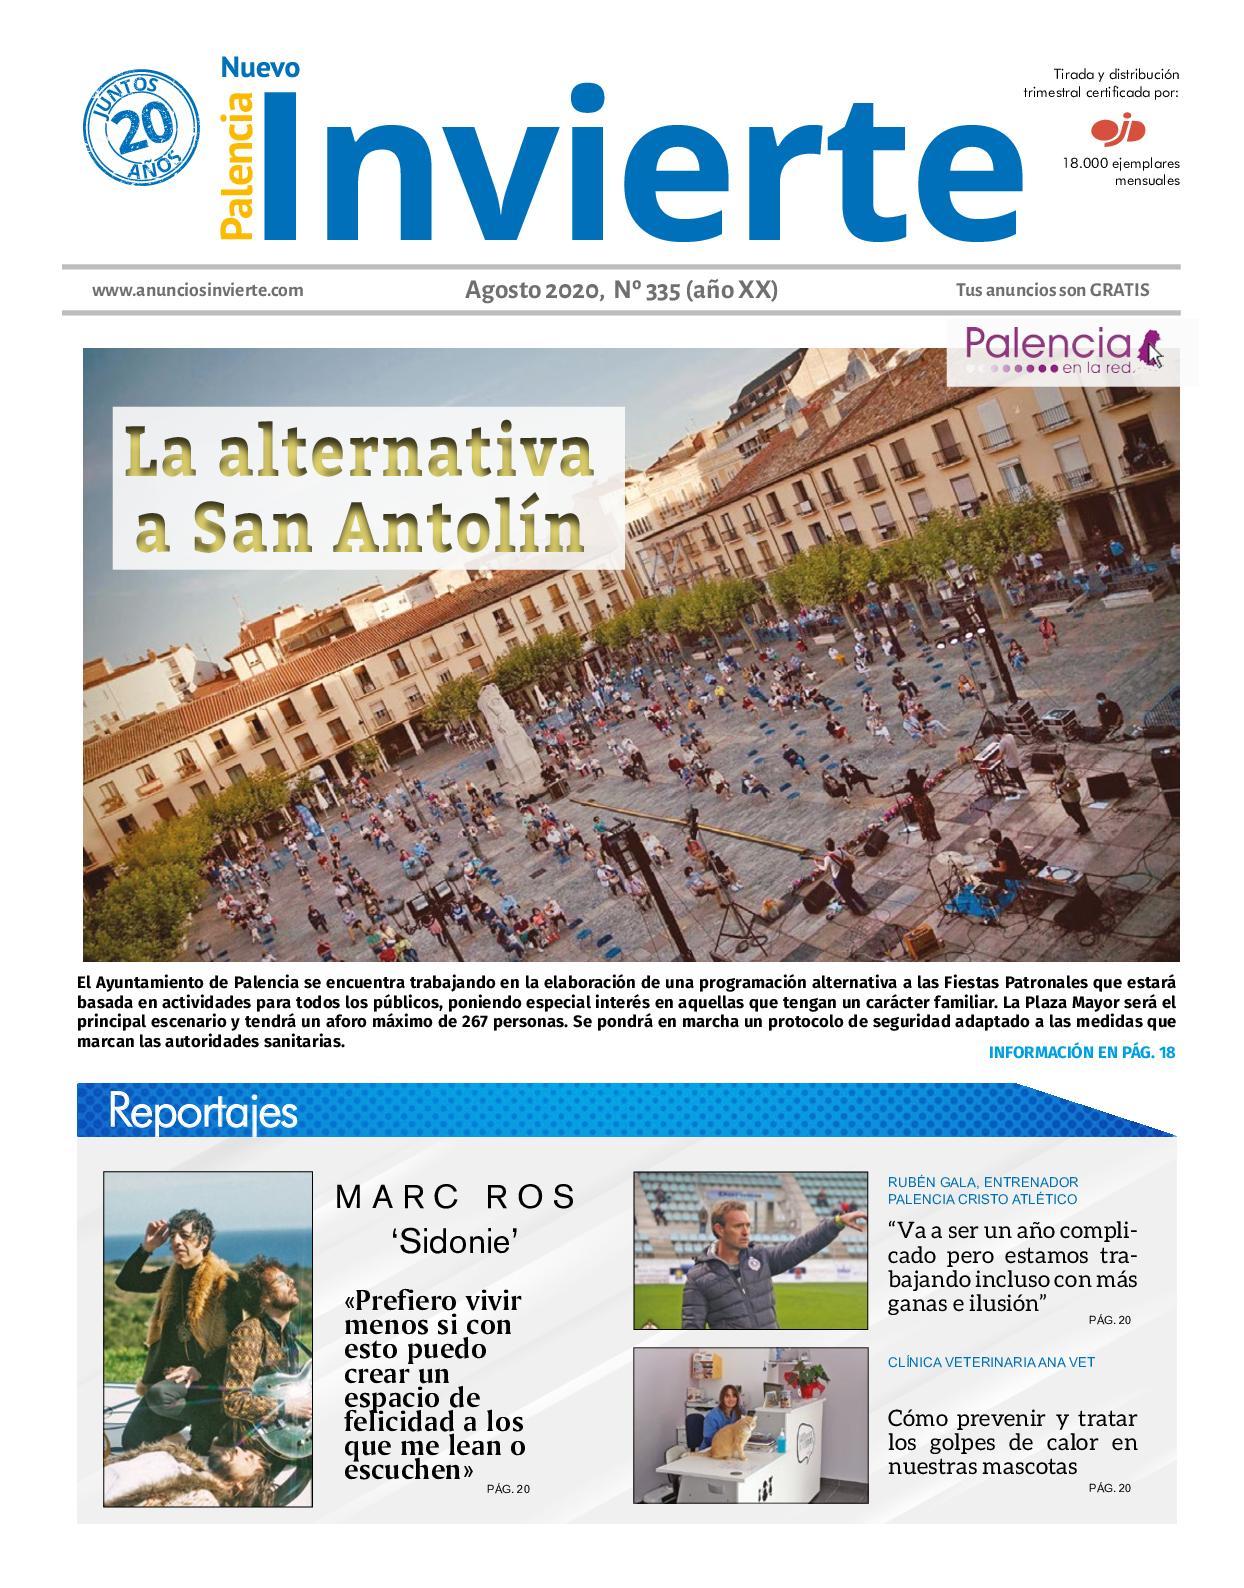 Peliculas porno gratis azafatas de 18 a 2 años Calameo Palencia Invierte Agosto 2020